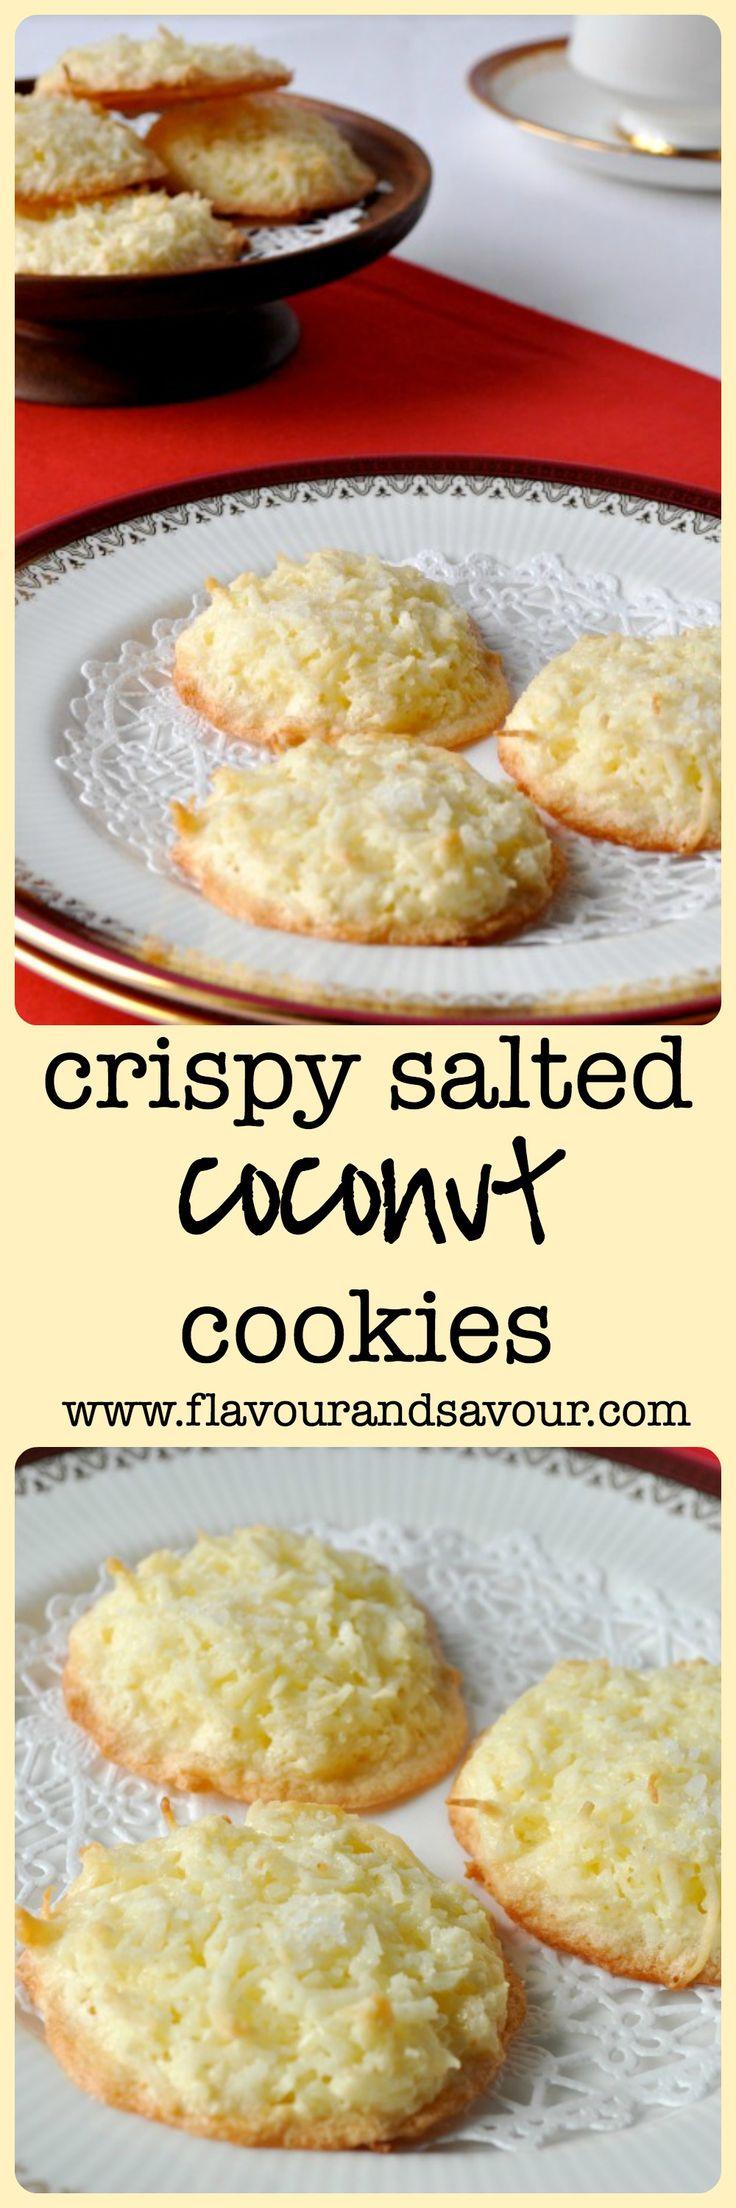 Crispy Salted Coconut Cookies